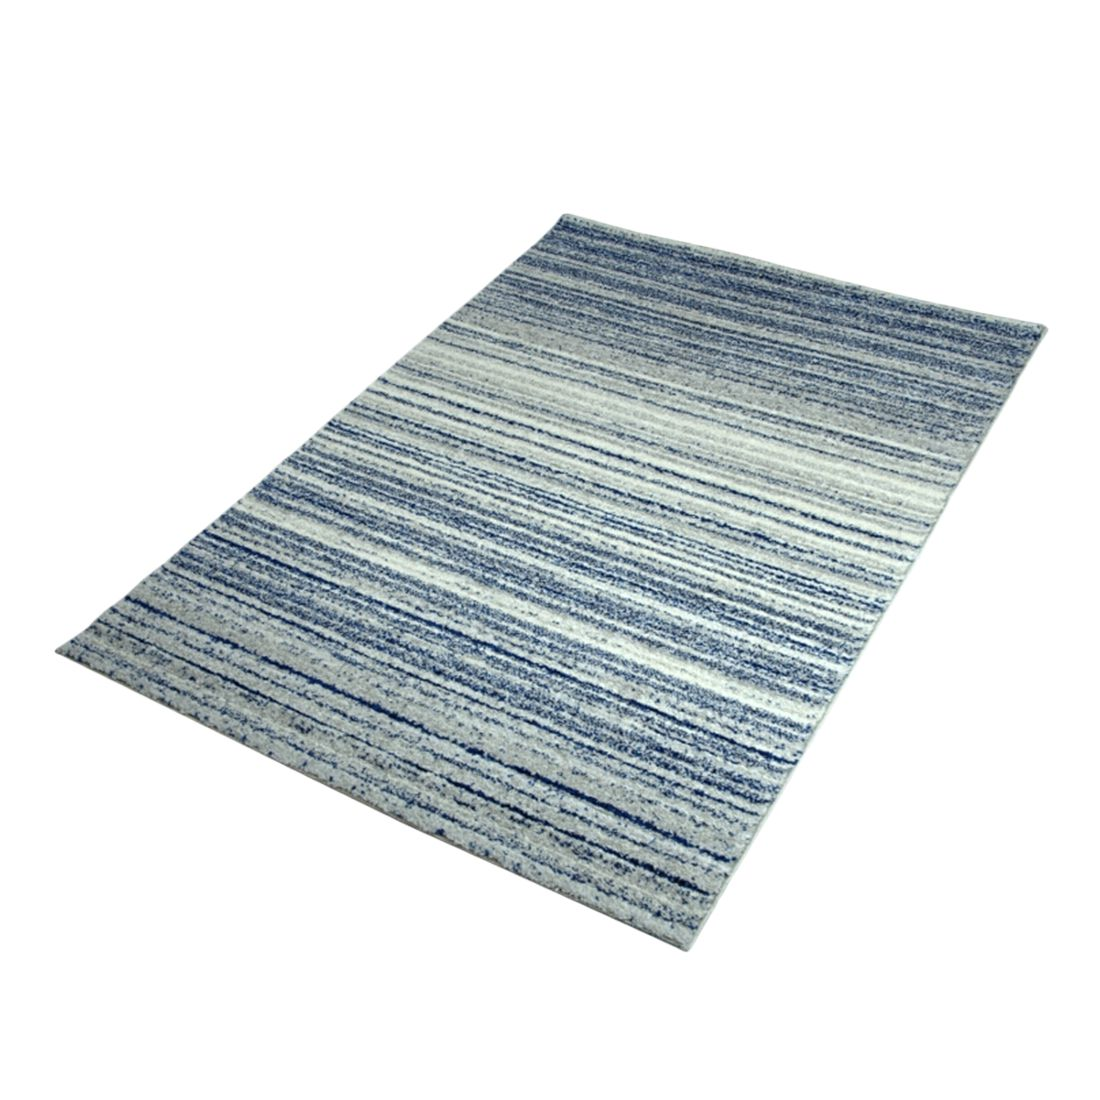 teppich casino 5119 blau 170 x 120 cm kc handel bestellen. Black Bedroom Furniture Sets. Home Design Ideas